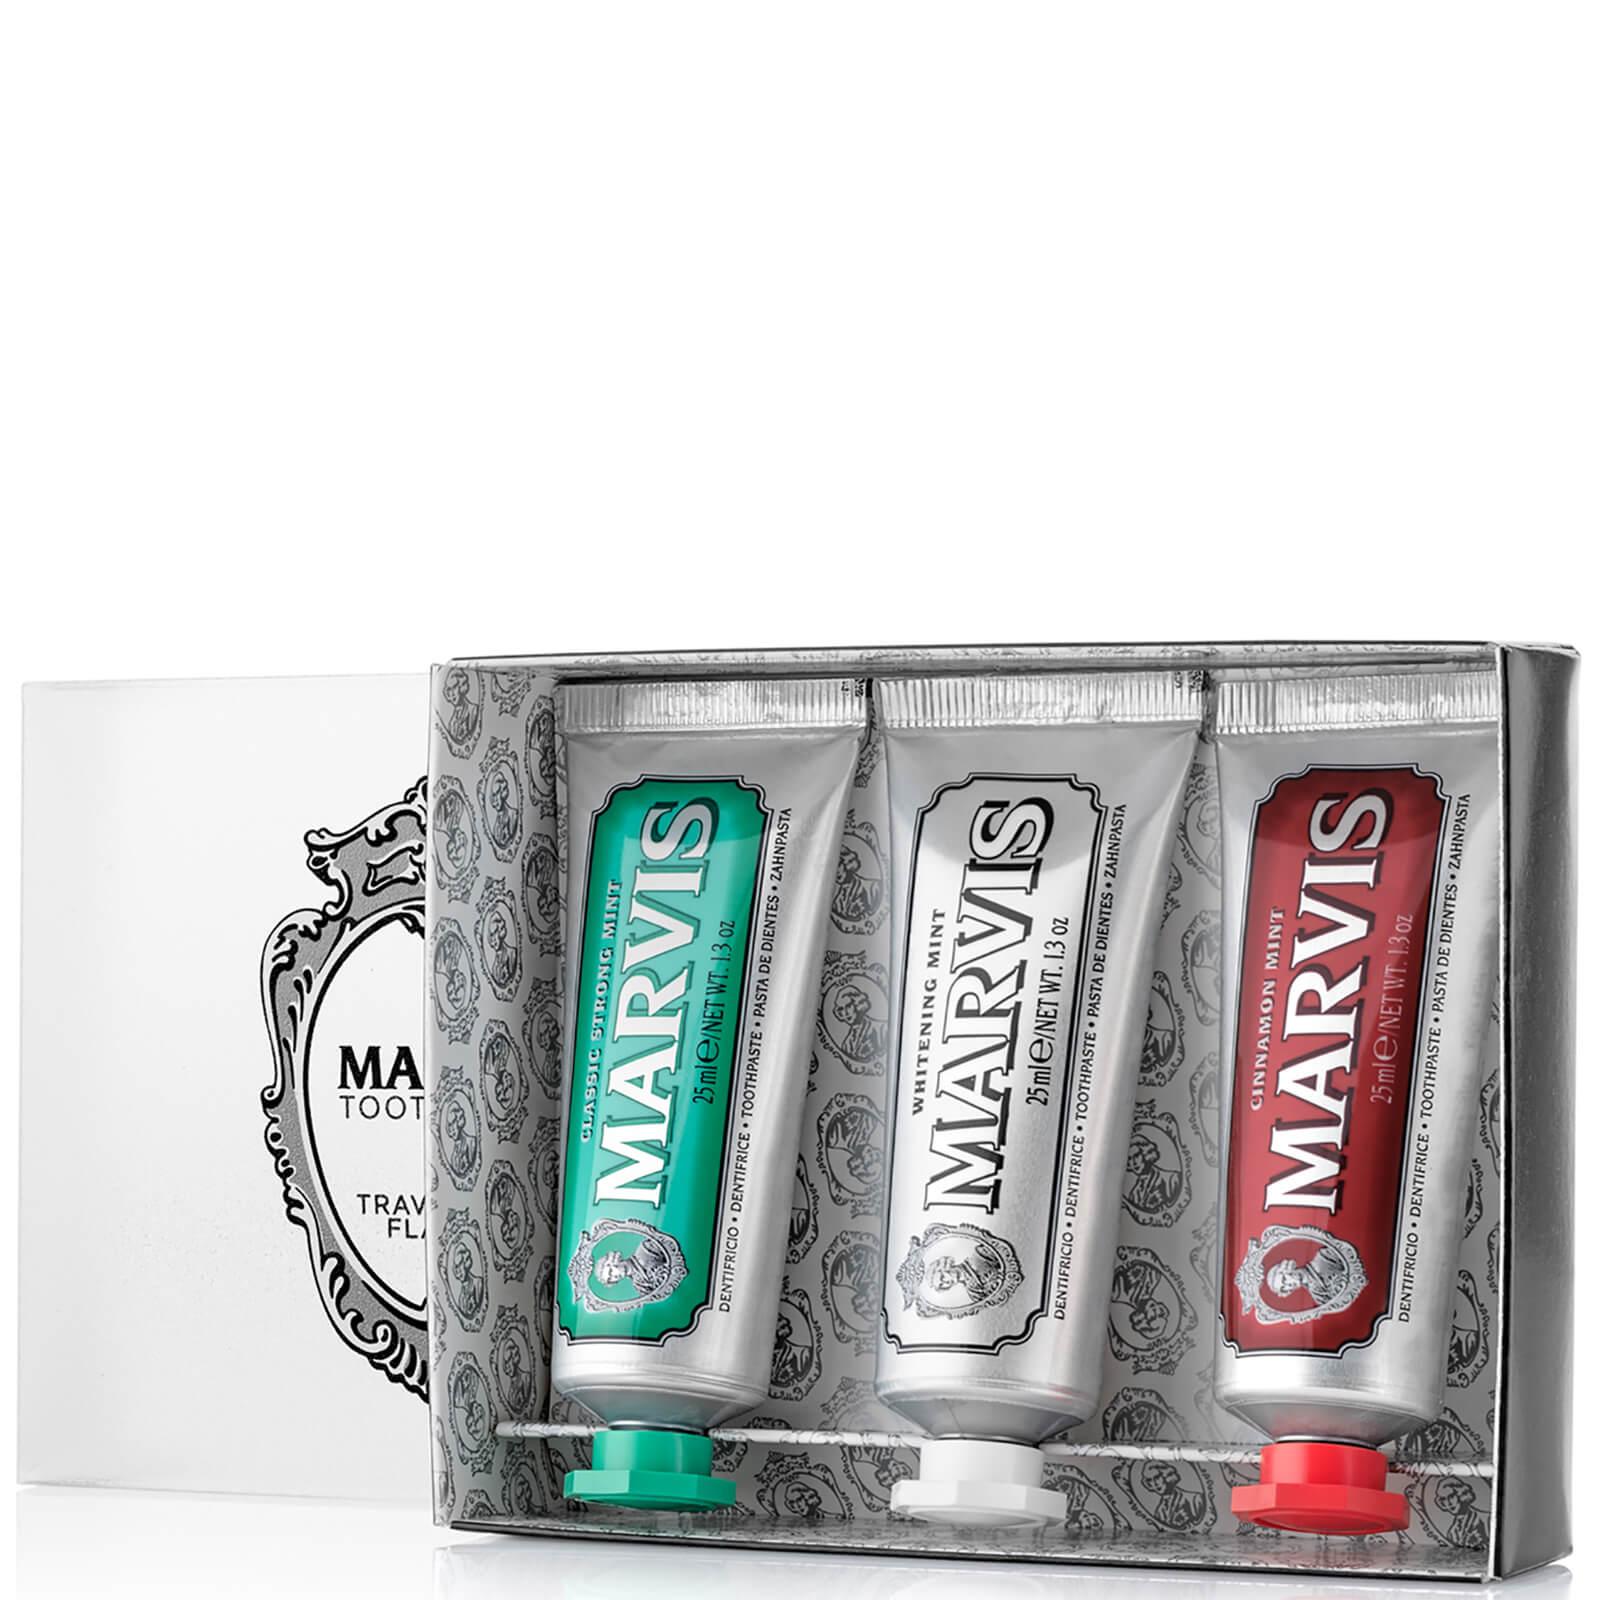 Marvis Travel Flavour Toothpaste Trio 3 x 25ml